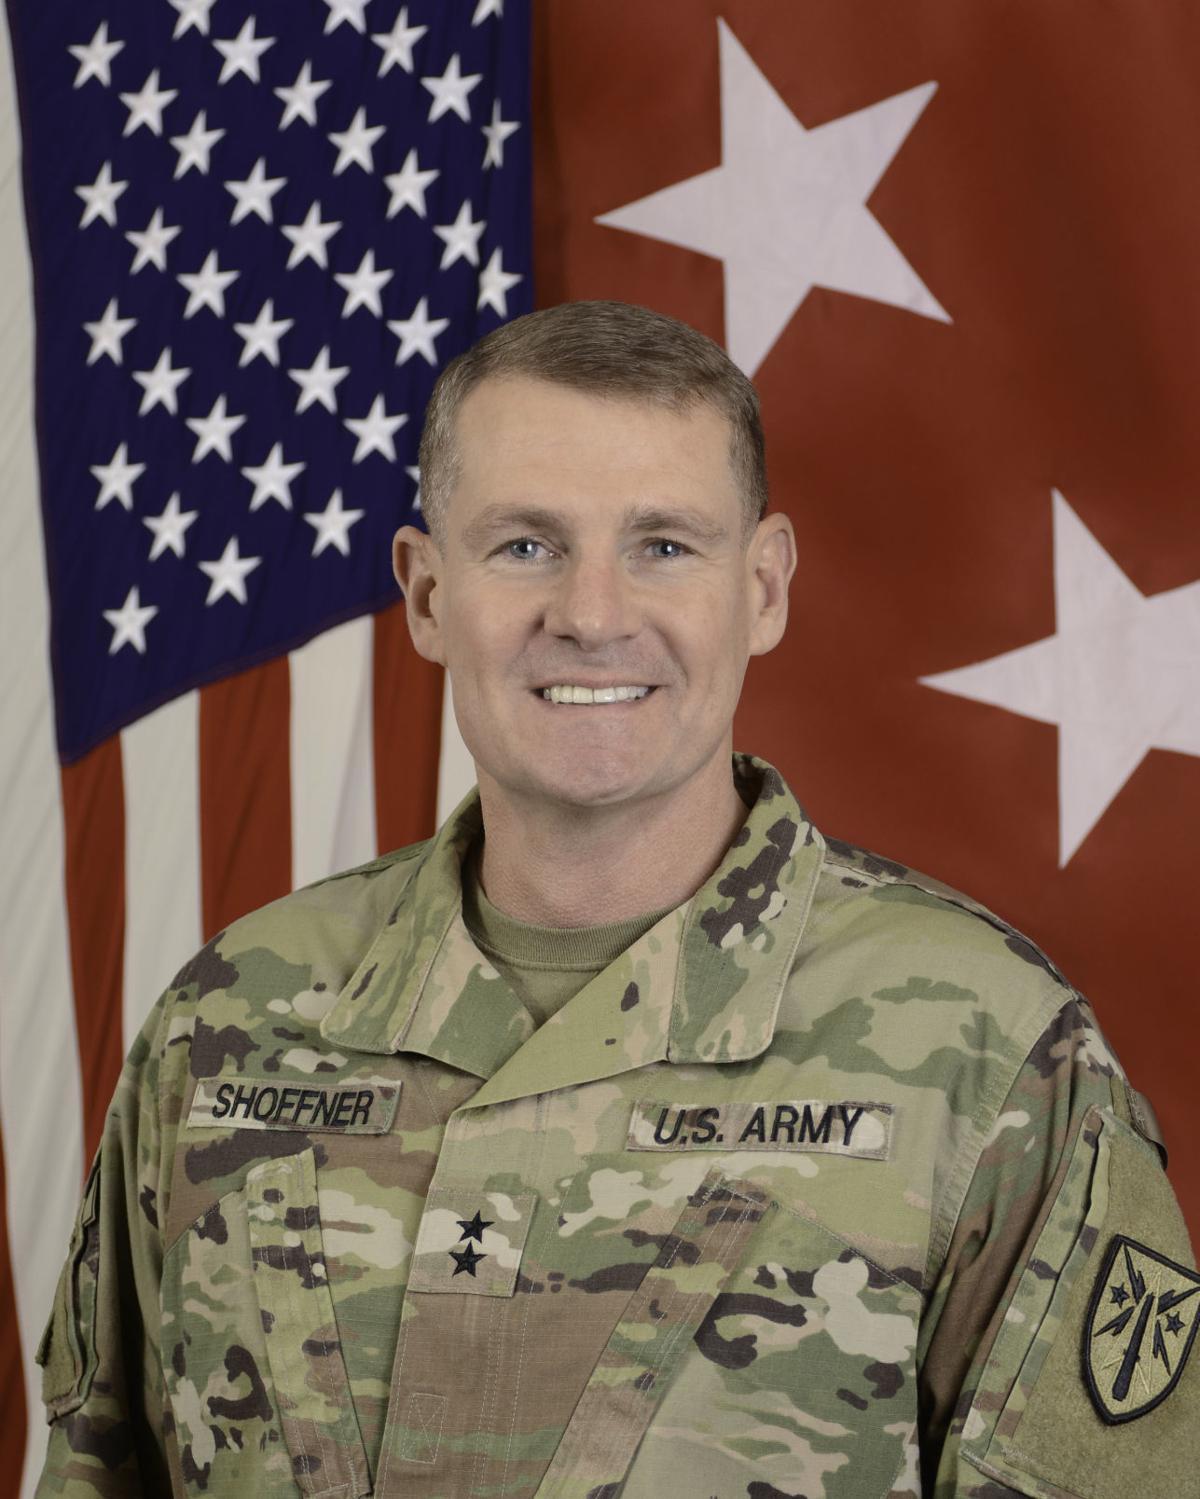 Maj. Gen. Wilson Shoffner